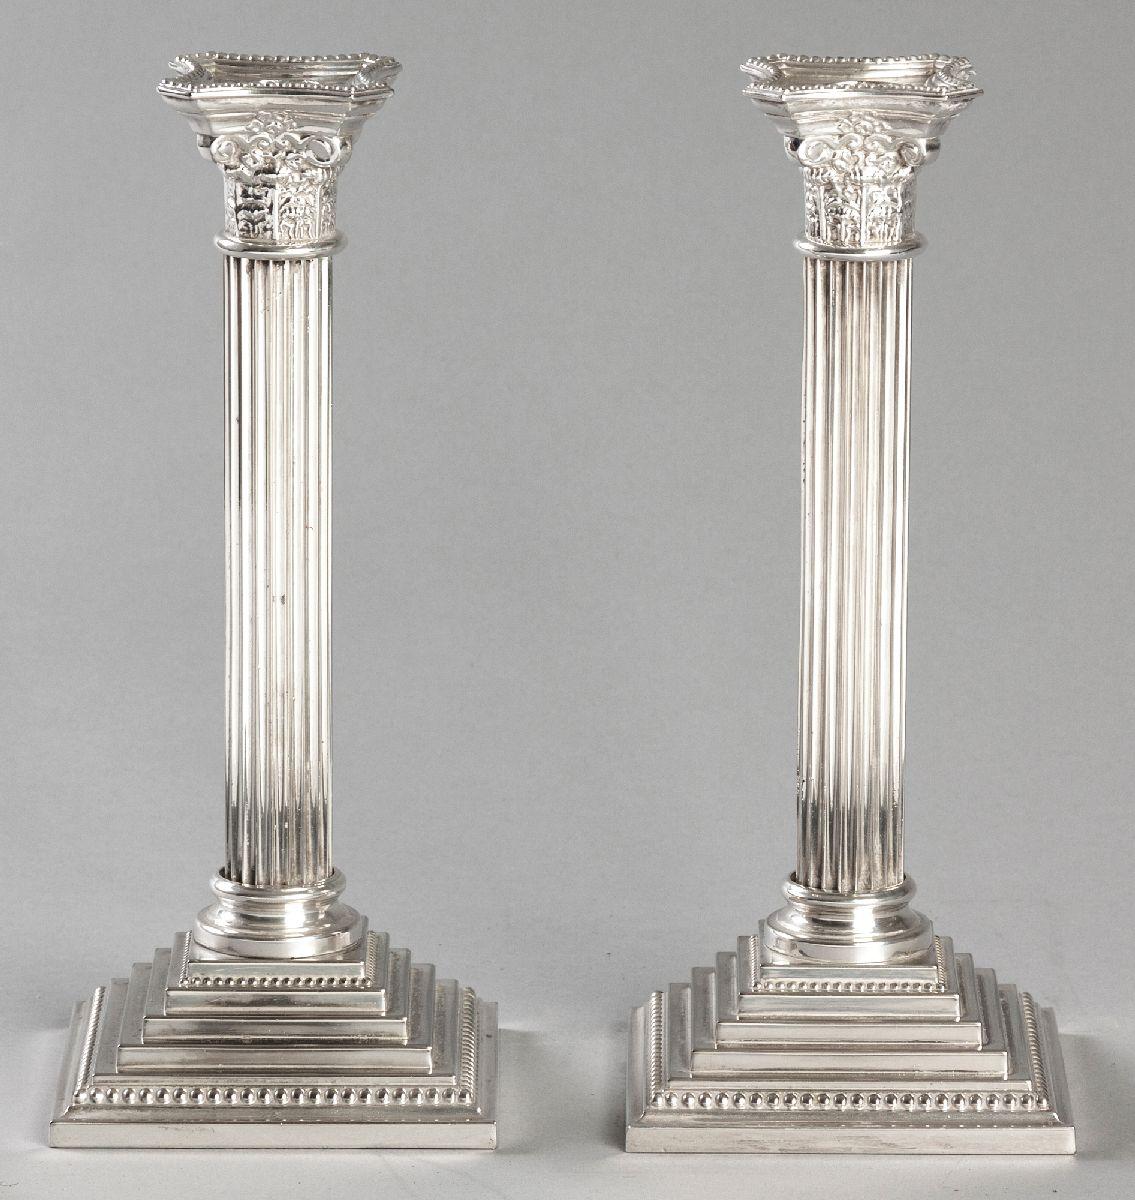 Lot 36 - A PAIR OF SILVERPLATE CORINTHIAN COLUMN CANDLESTICKS, BY GODDINGER, beaded, rimmed wax pans, of